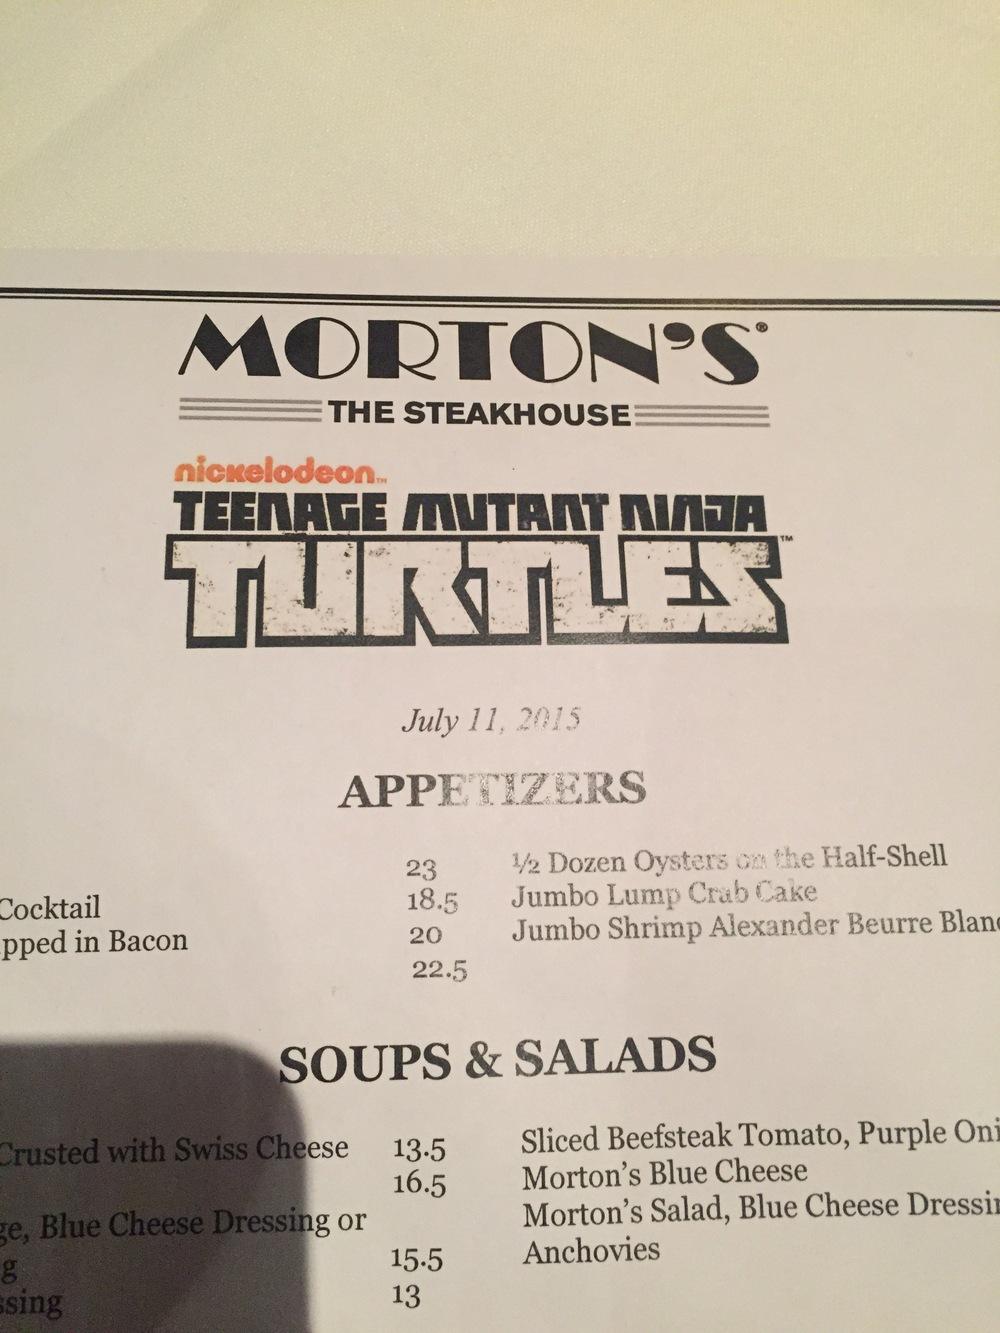 Do turtles eat steak?